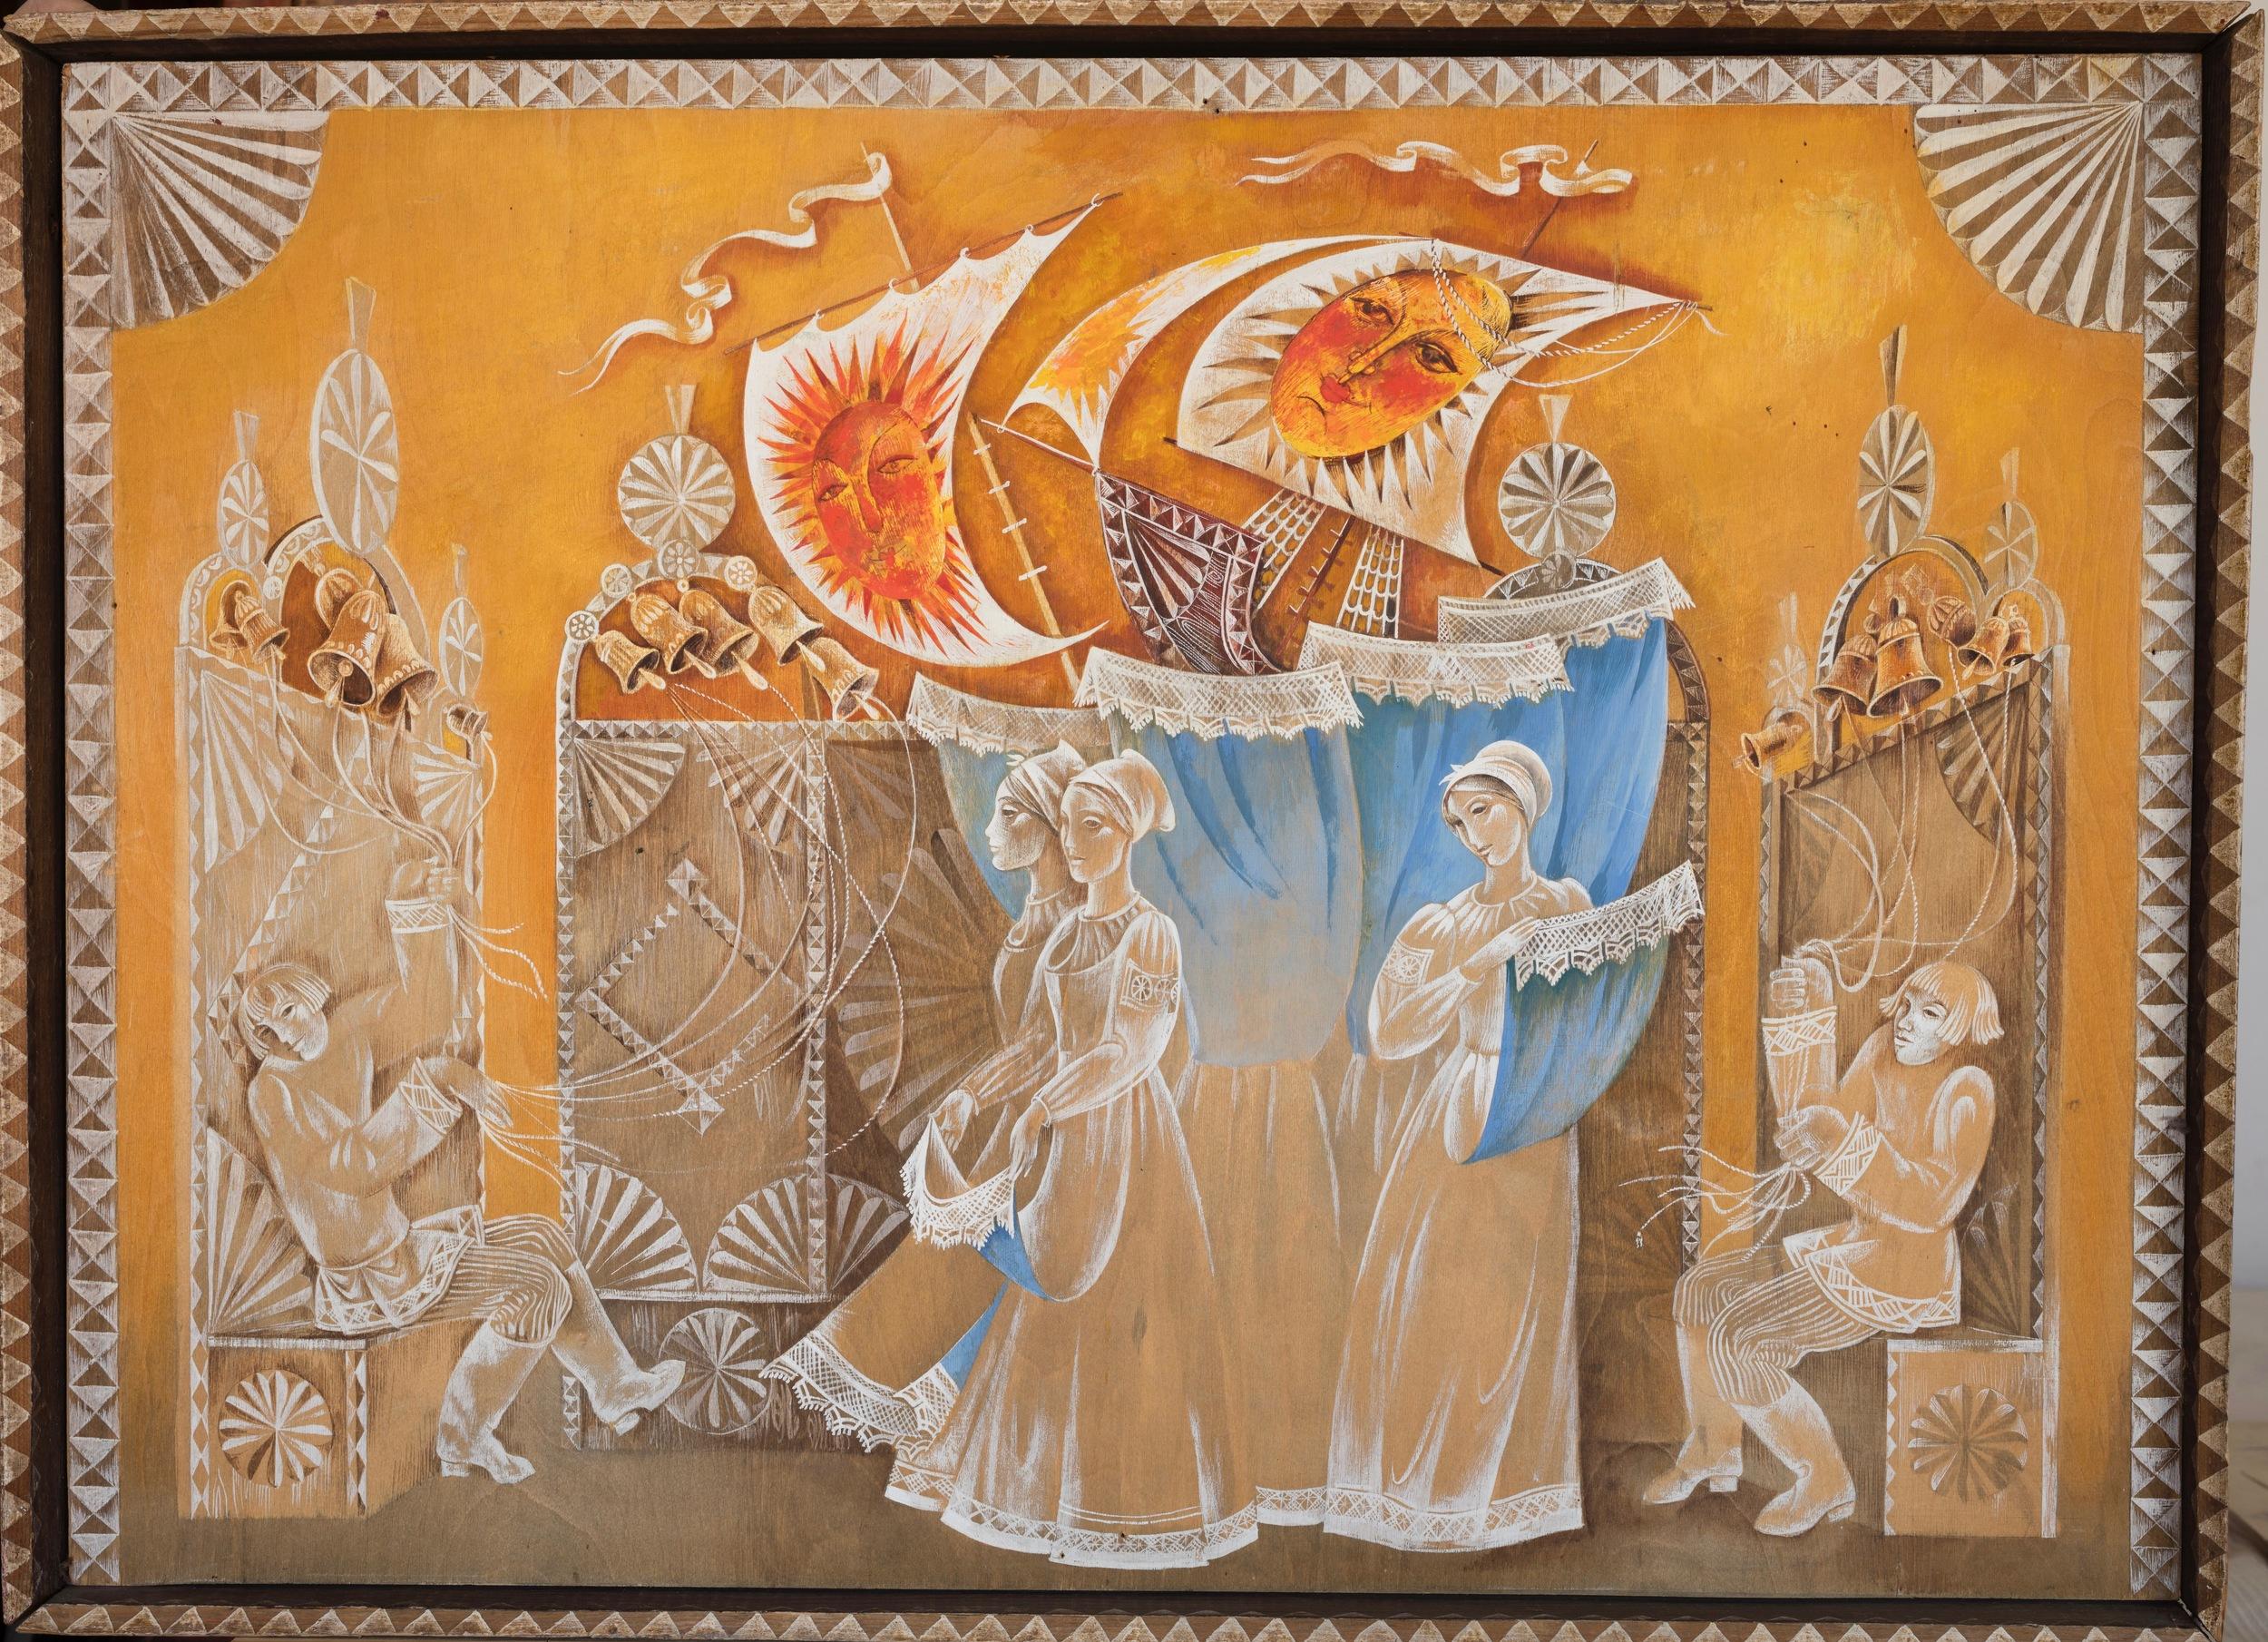 Tale of Tzar Saltan  Obrazcov Puppet Theatre. Moscow 1974